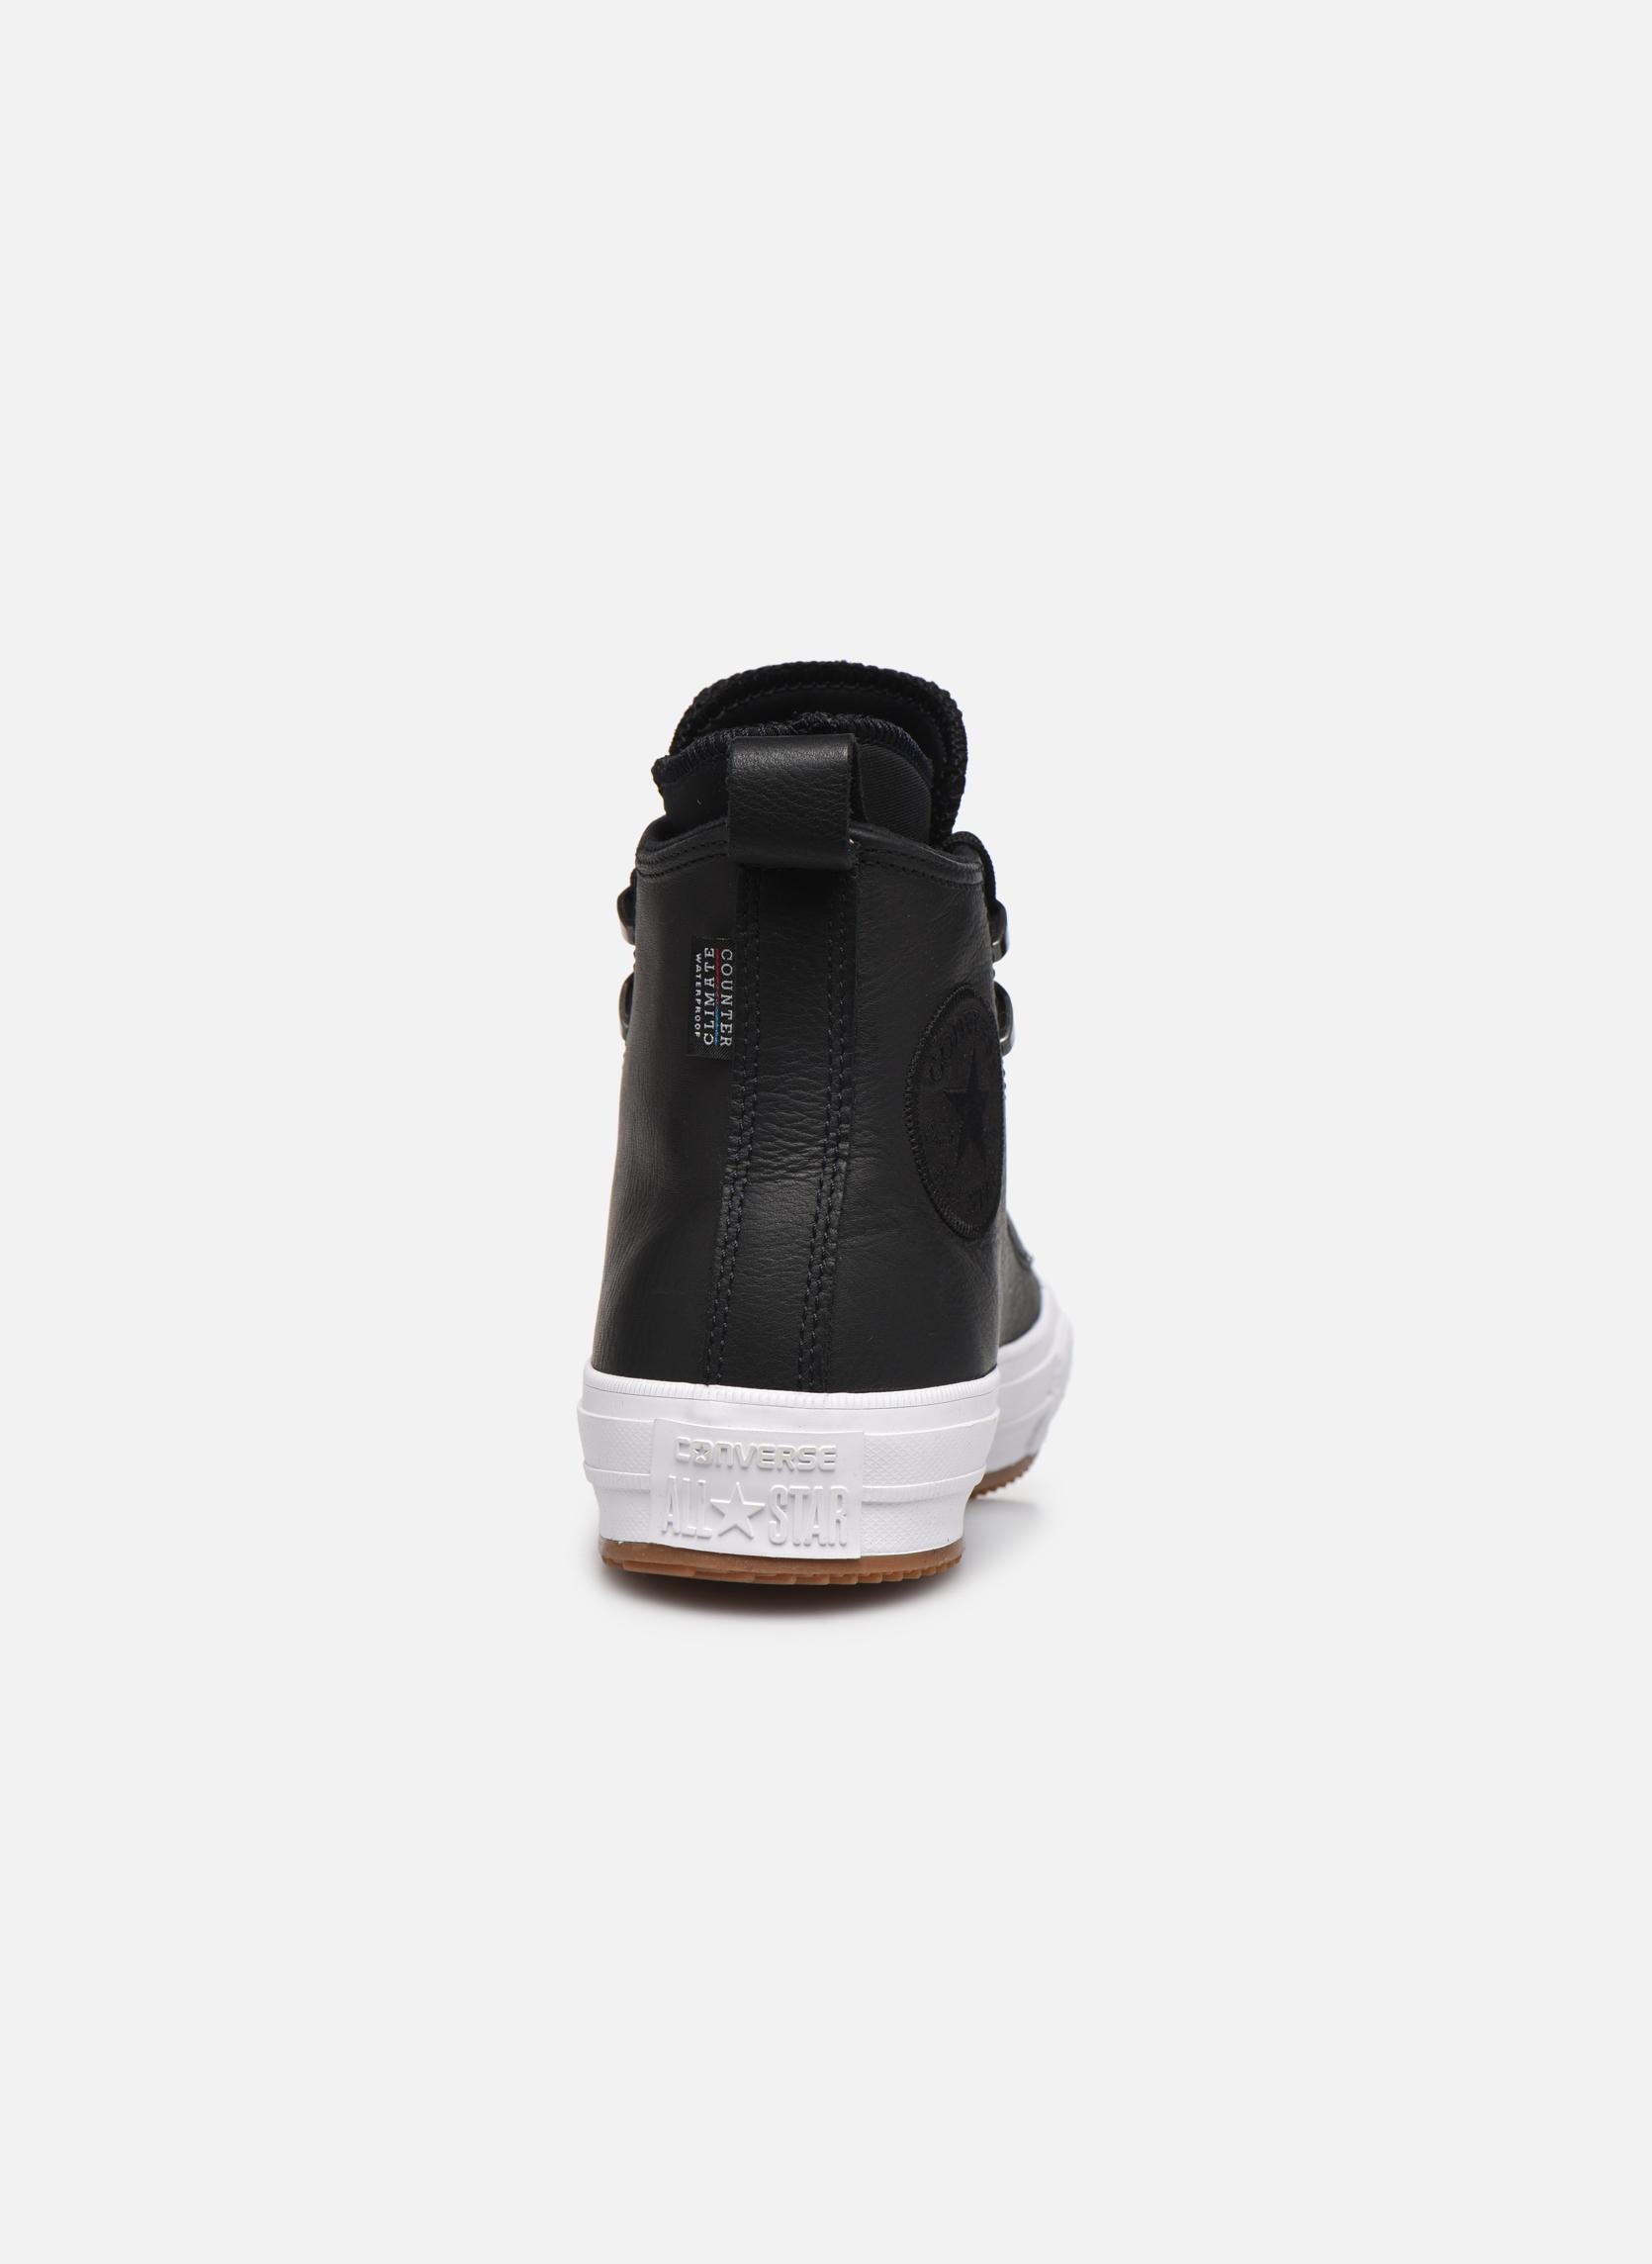 Black/black/white Converse Chuck Taylor WP Boot WP Leather Hi (Noir)